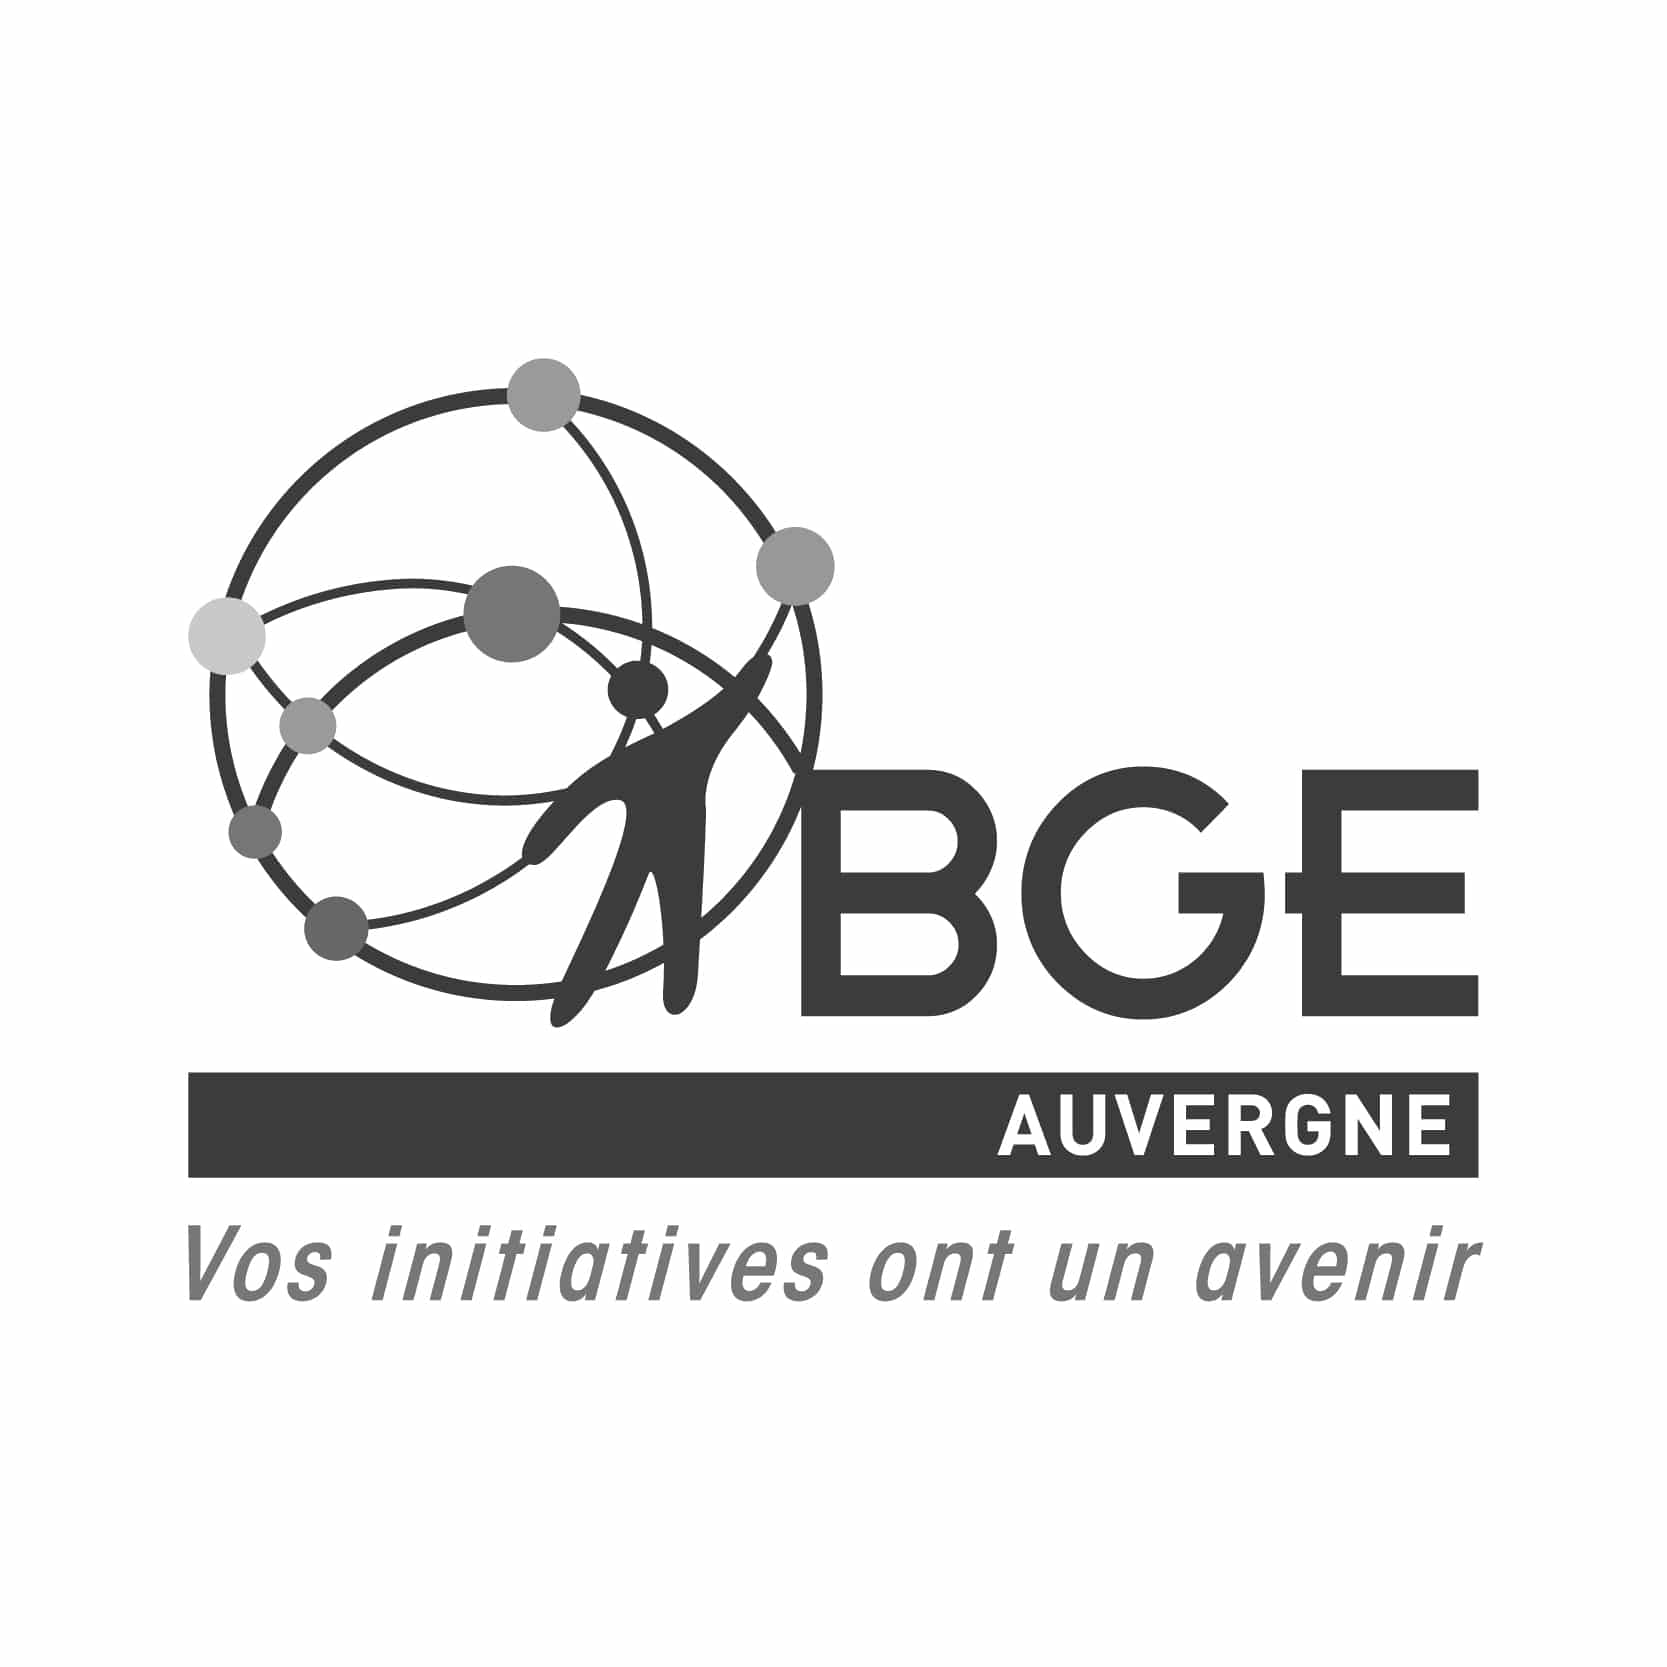 BGE Auvergne